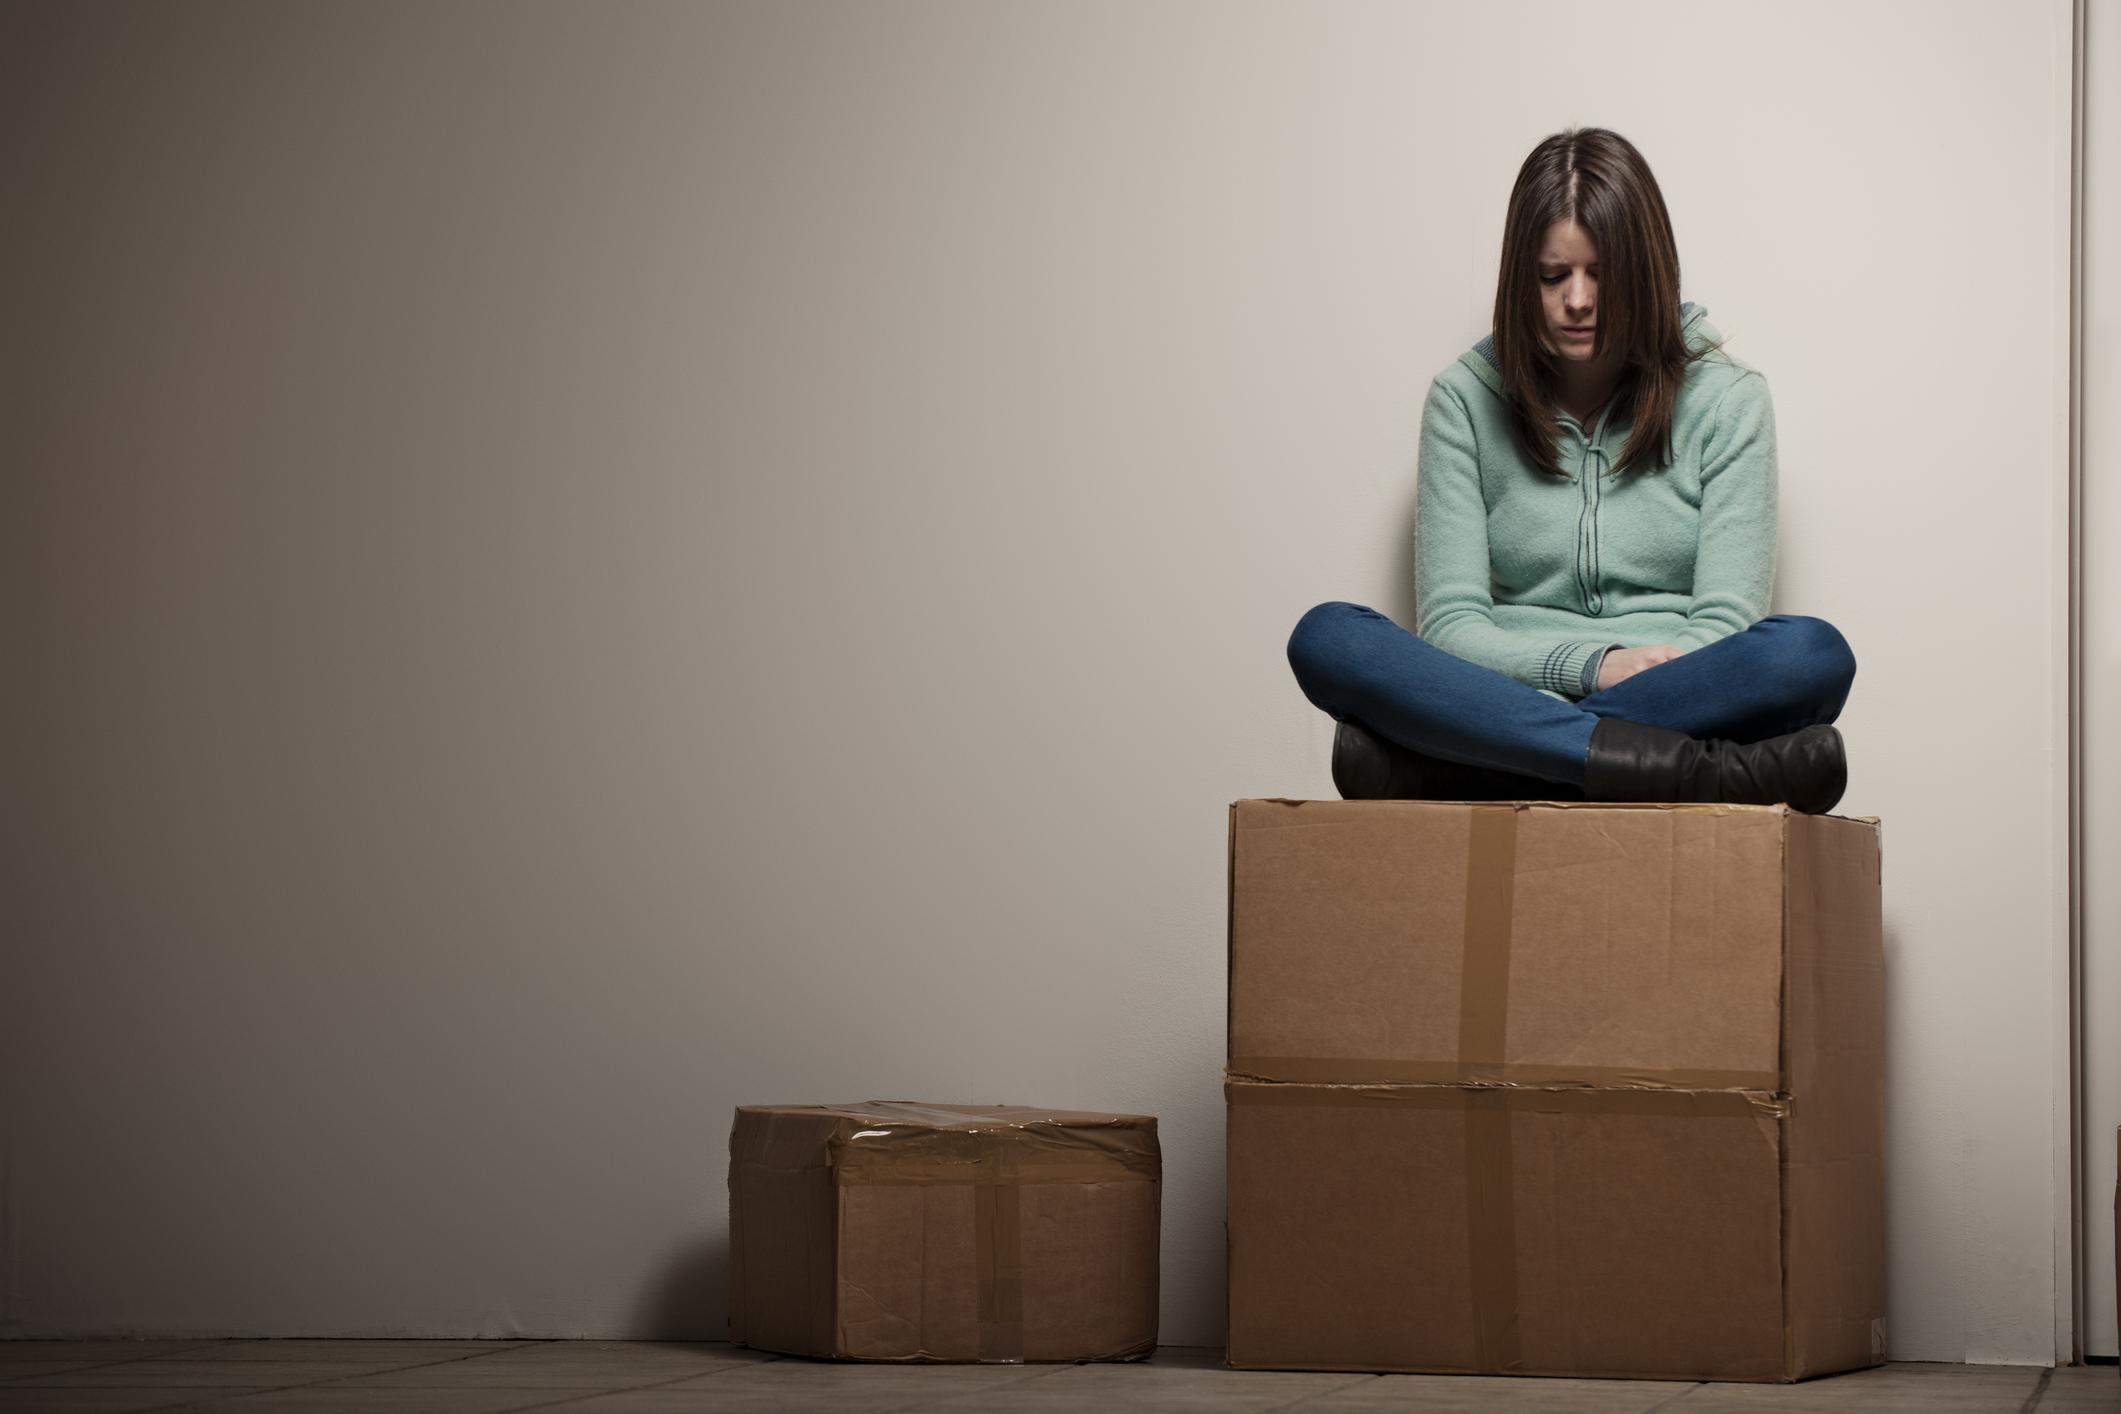 woman sitting on box